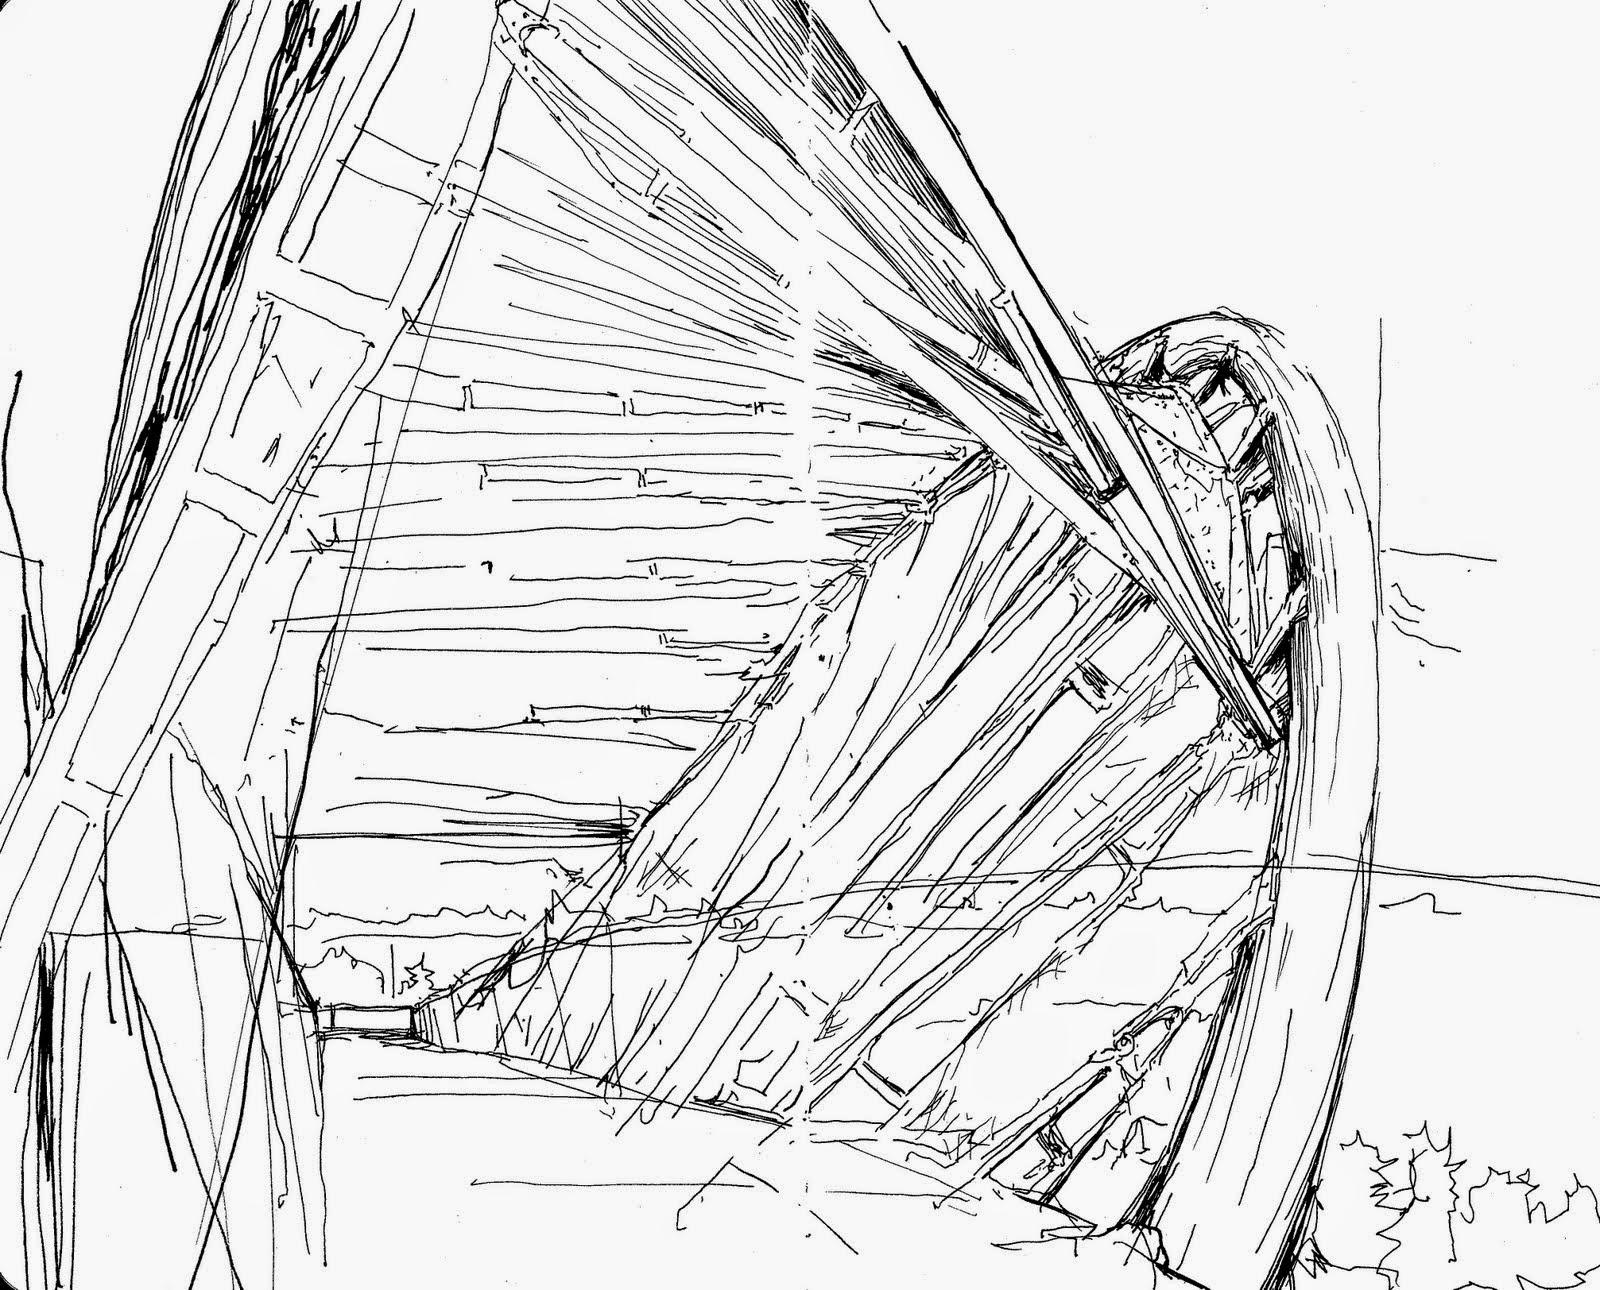 Architectural Design Studio 1